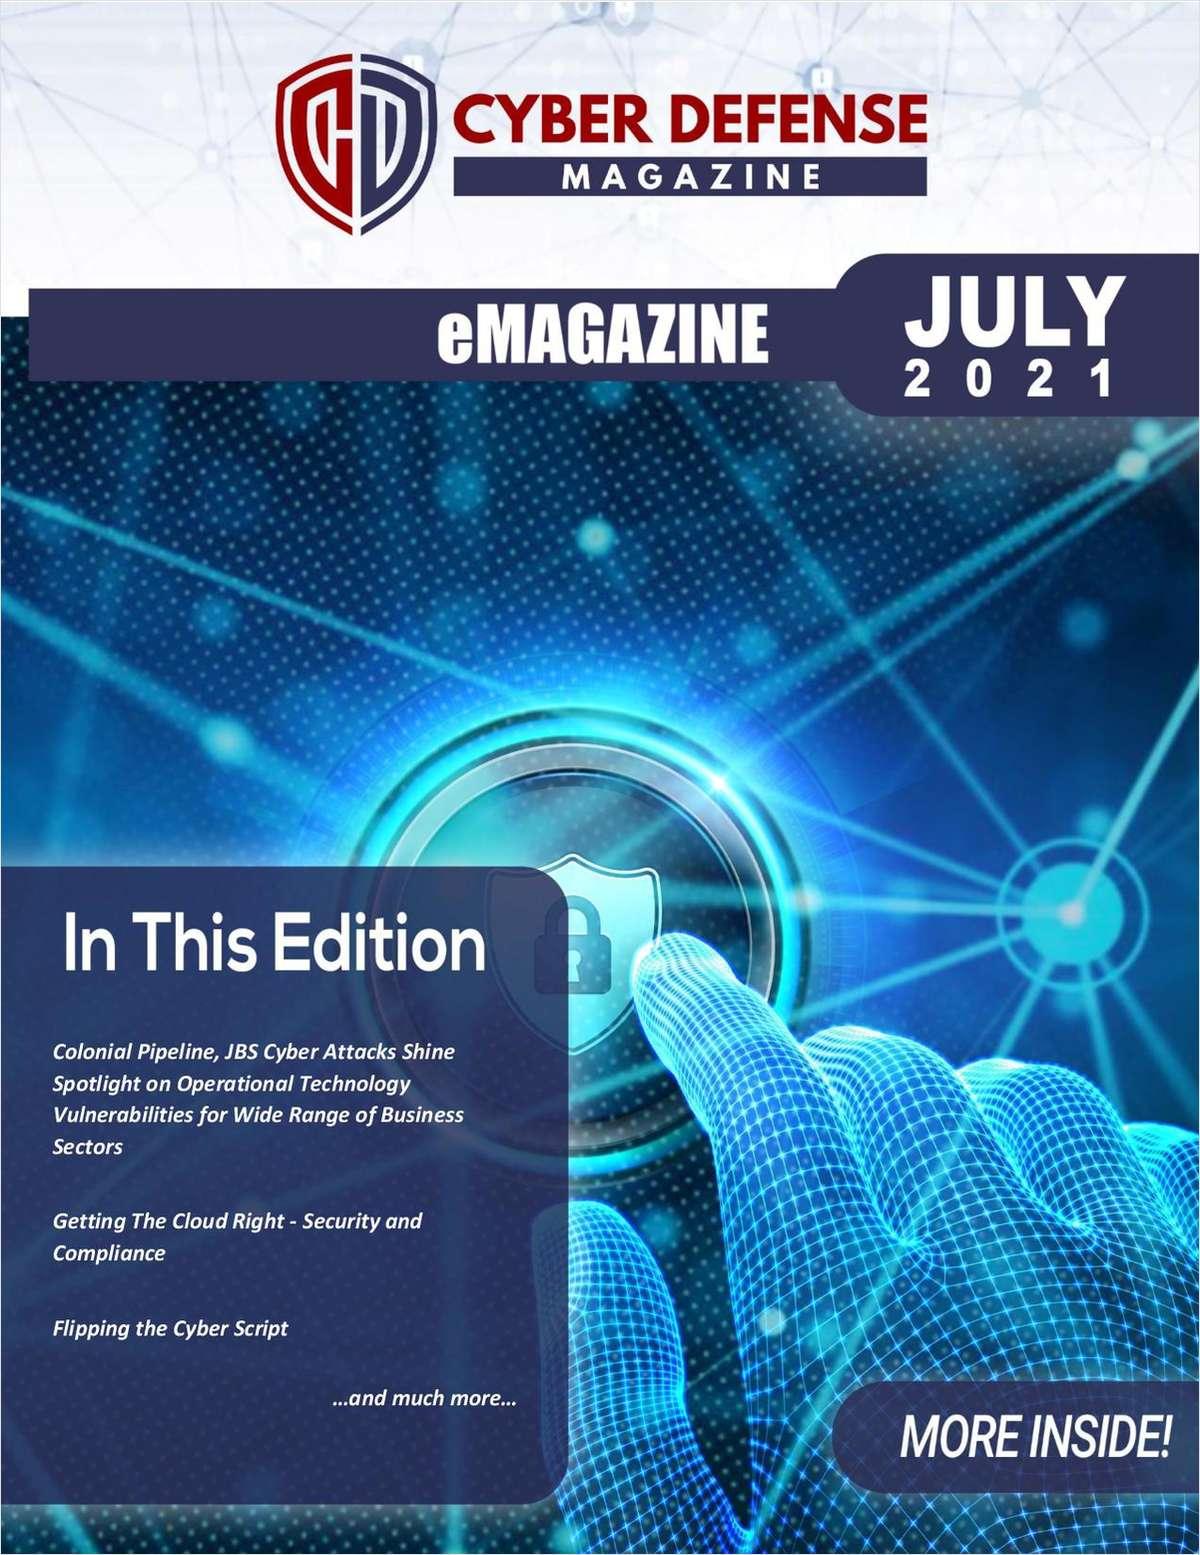 Cyber Defense Magazine July 2021 Edition